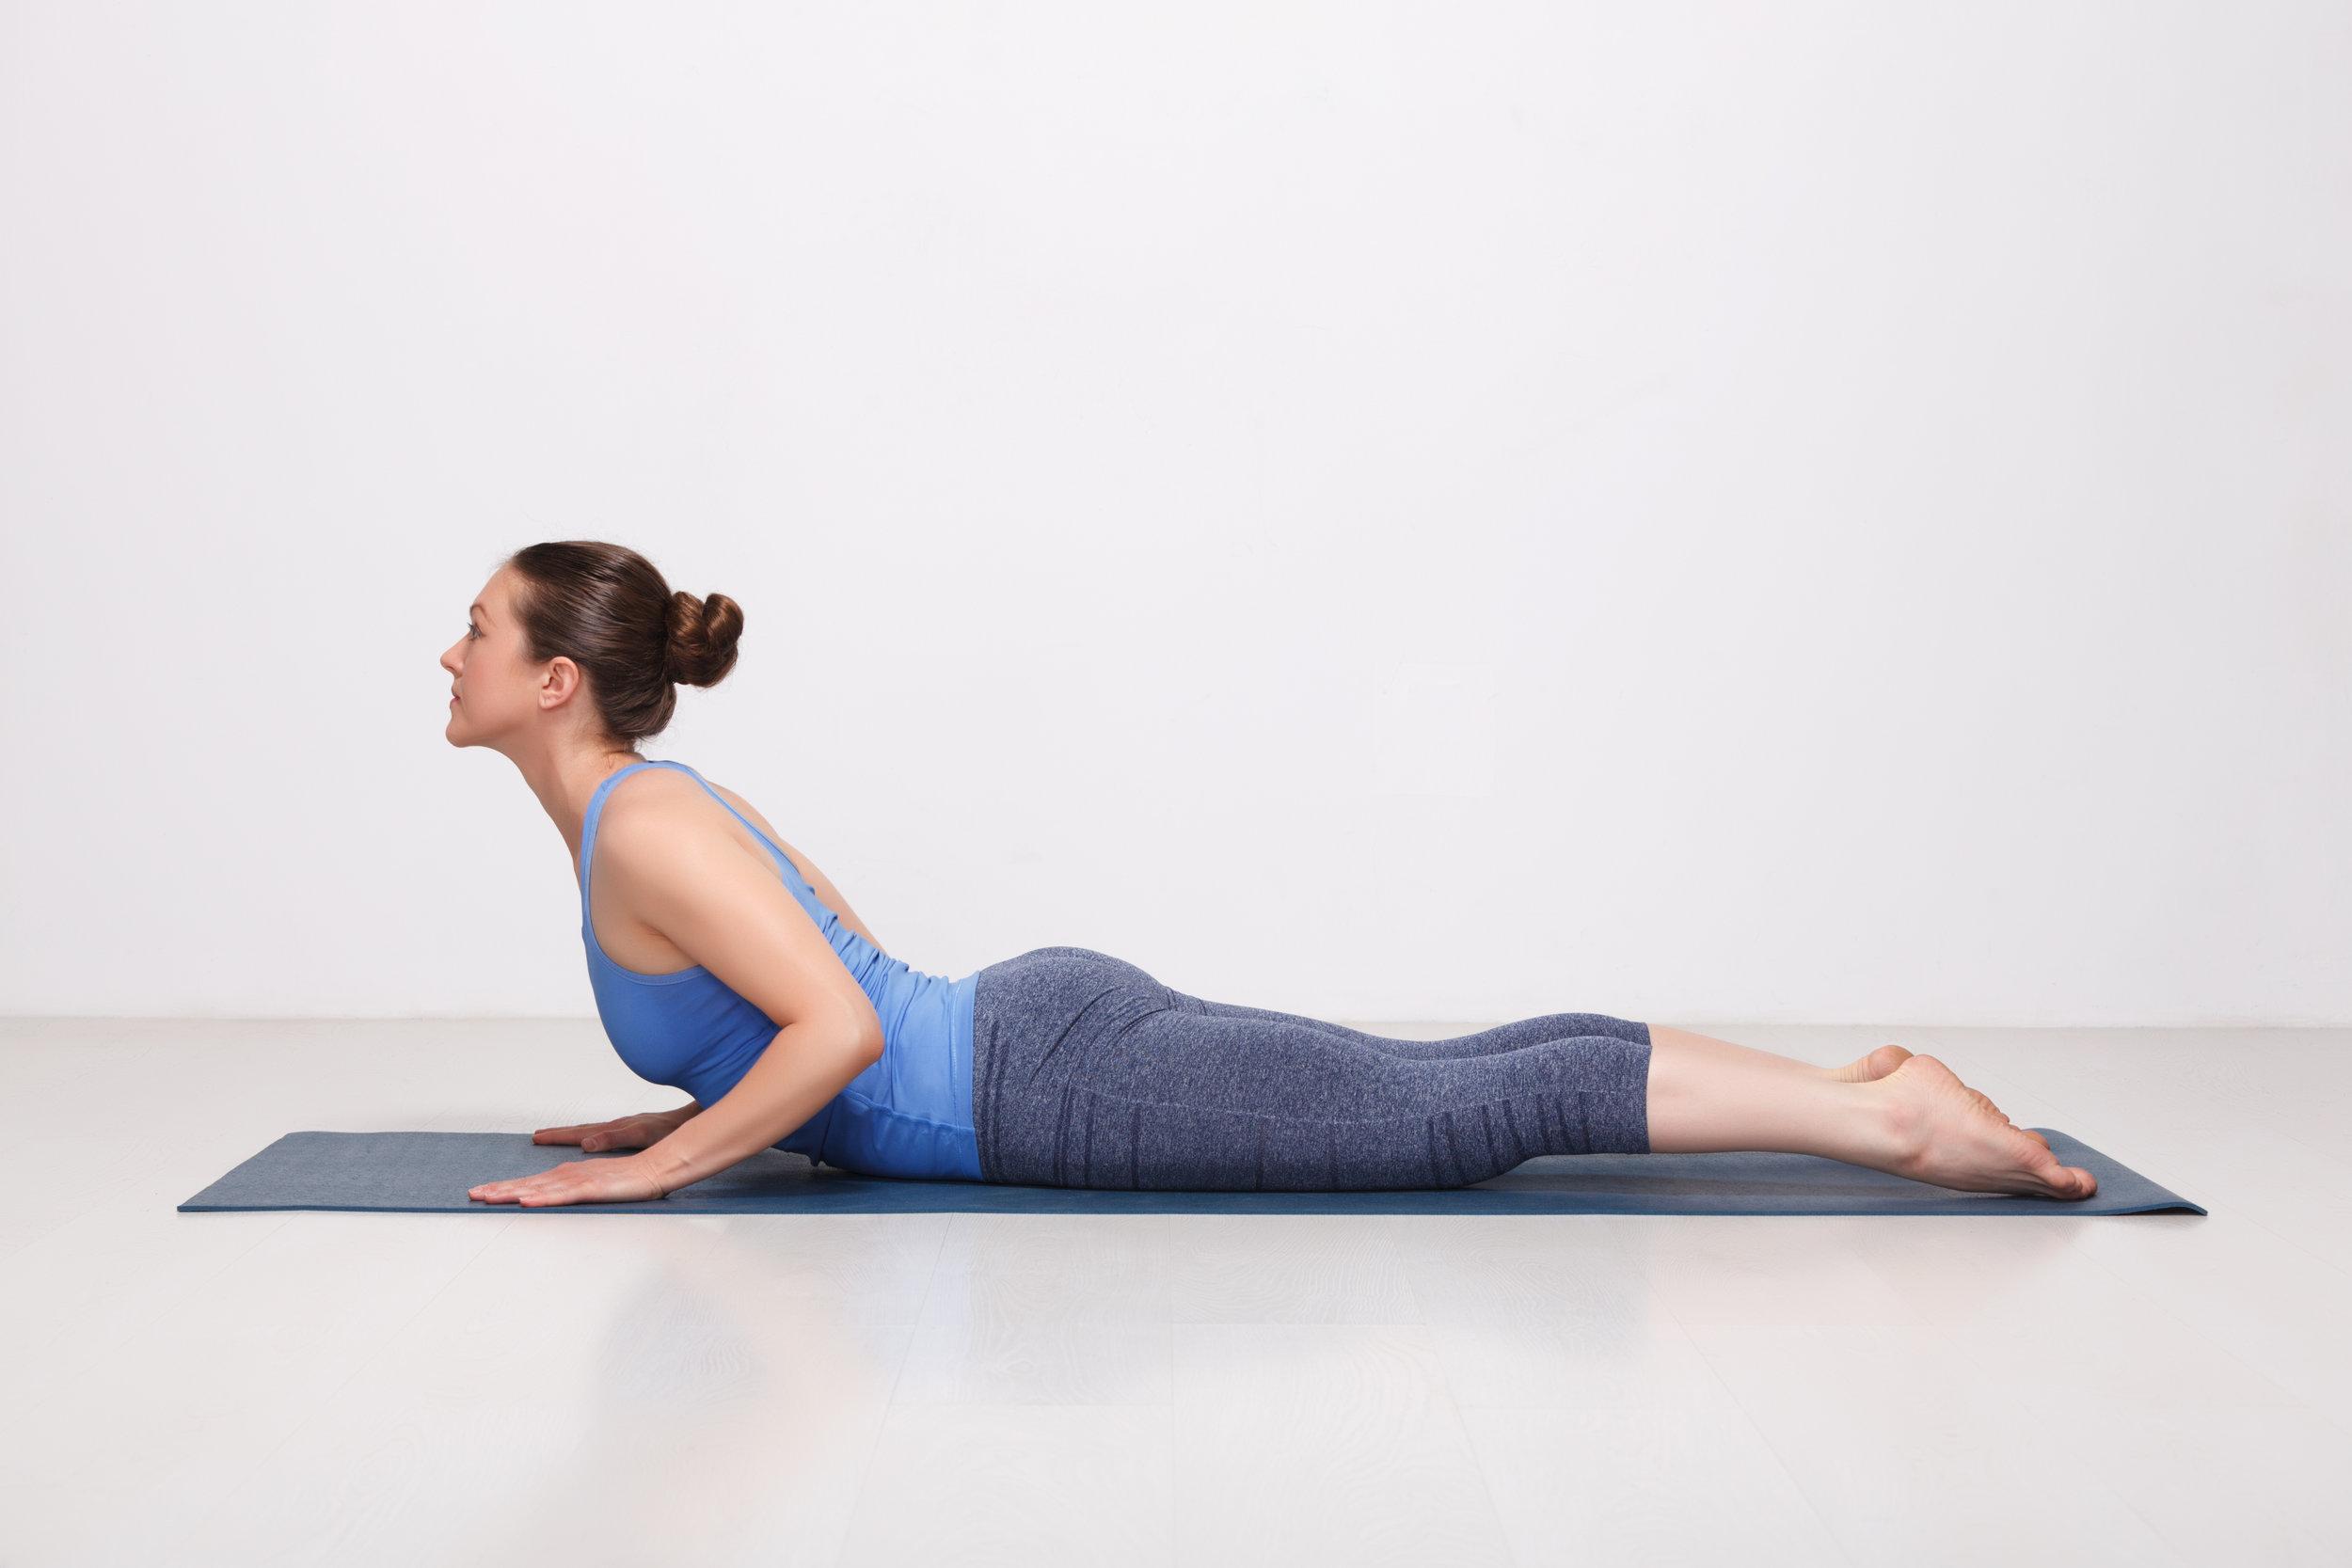 Psychotherapeutic Yoga